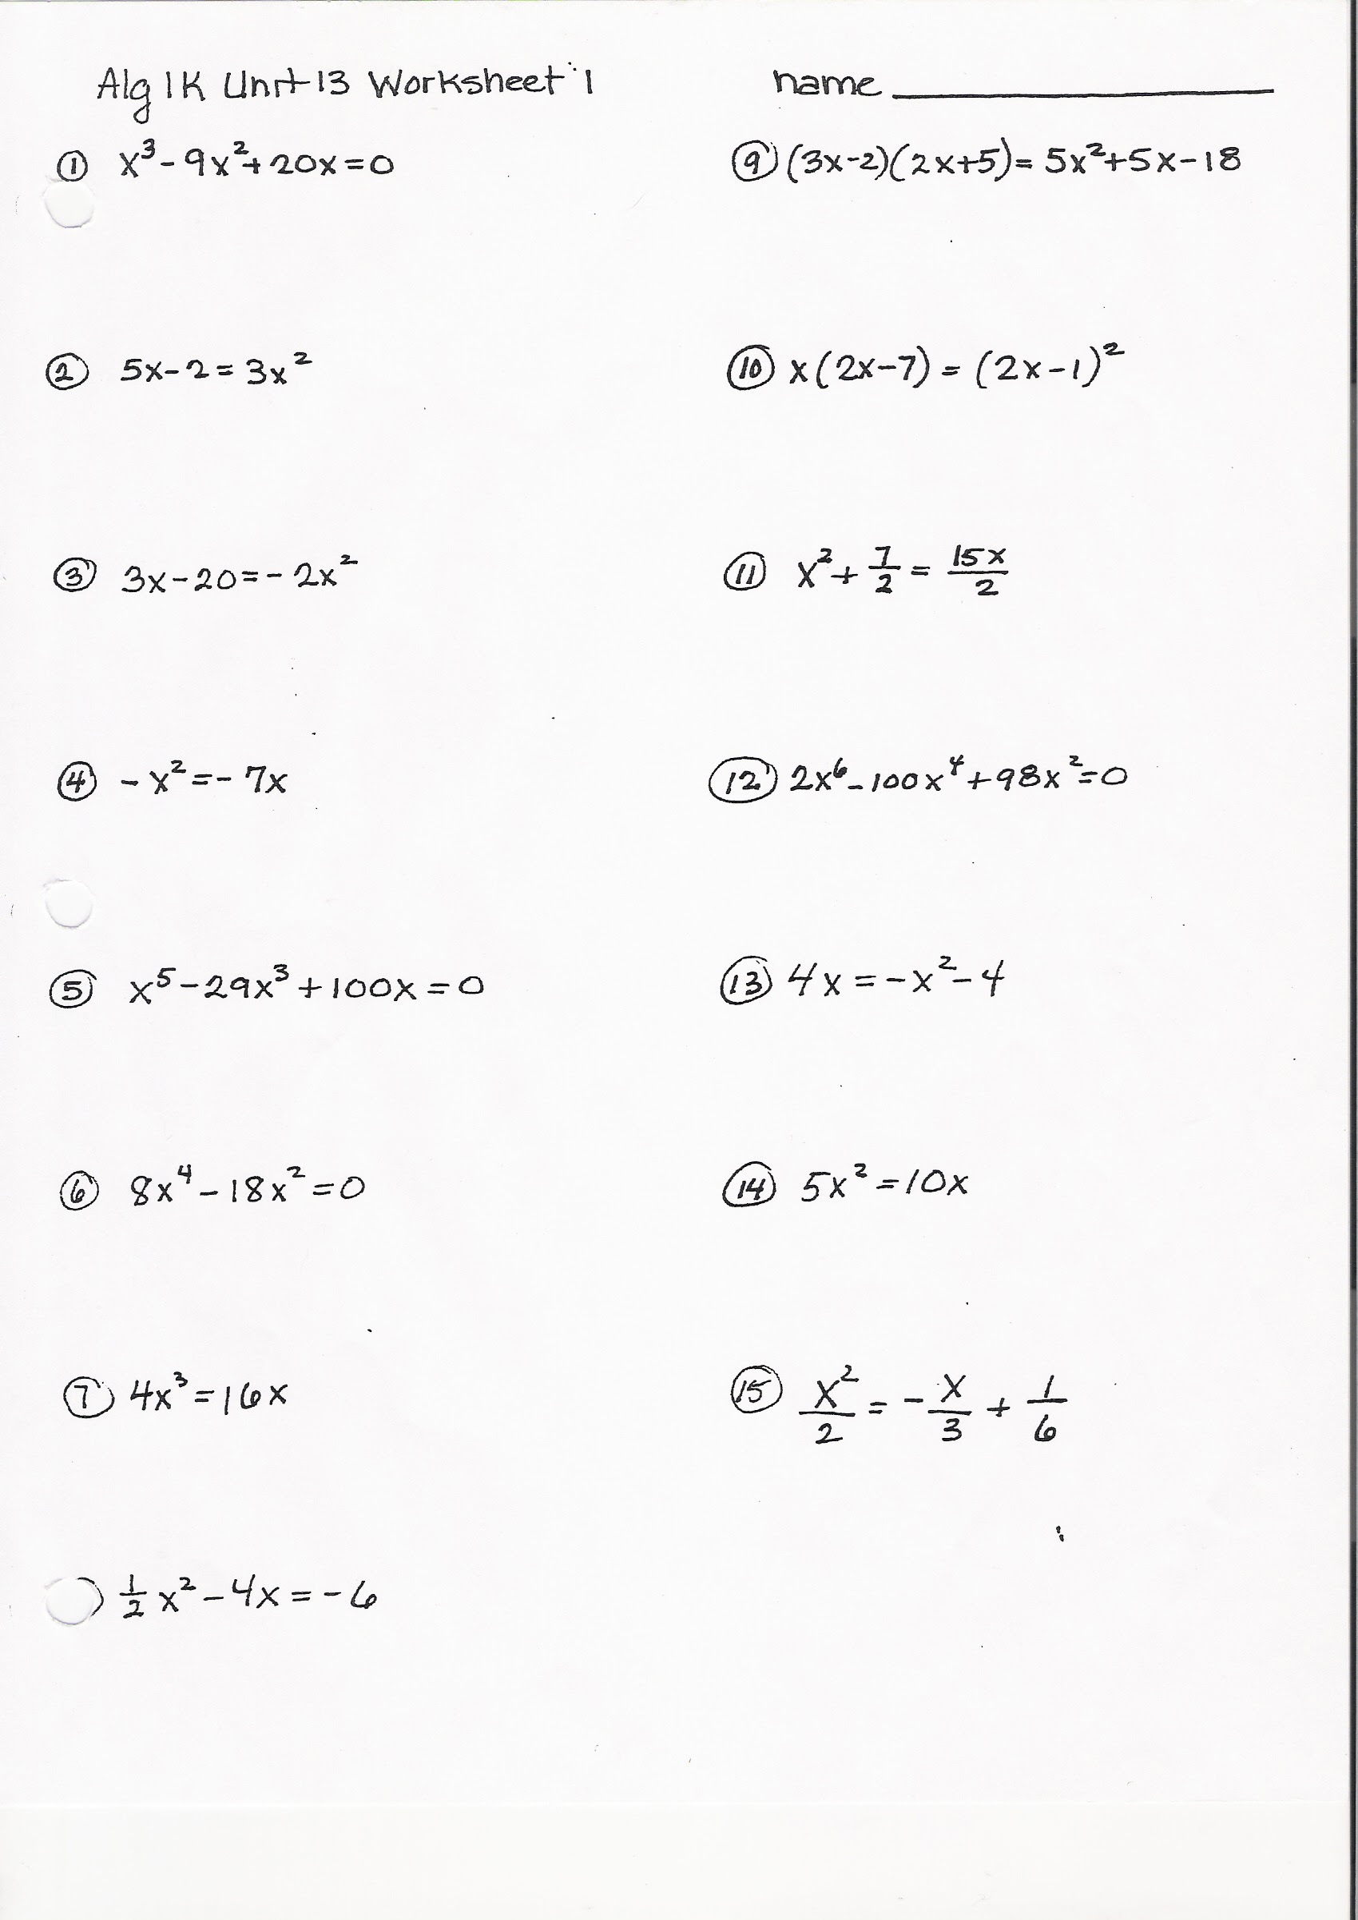 - 34 Algebra 2 Factoring Worksheet - Worksheet Resource Plans